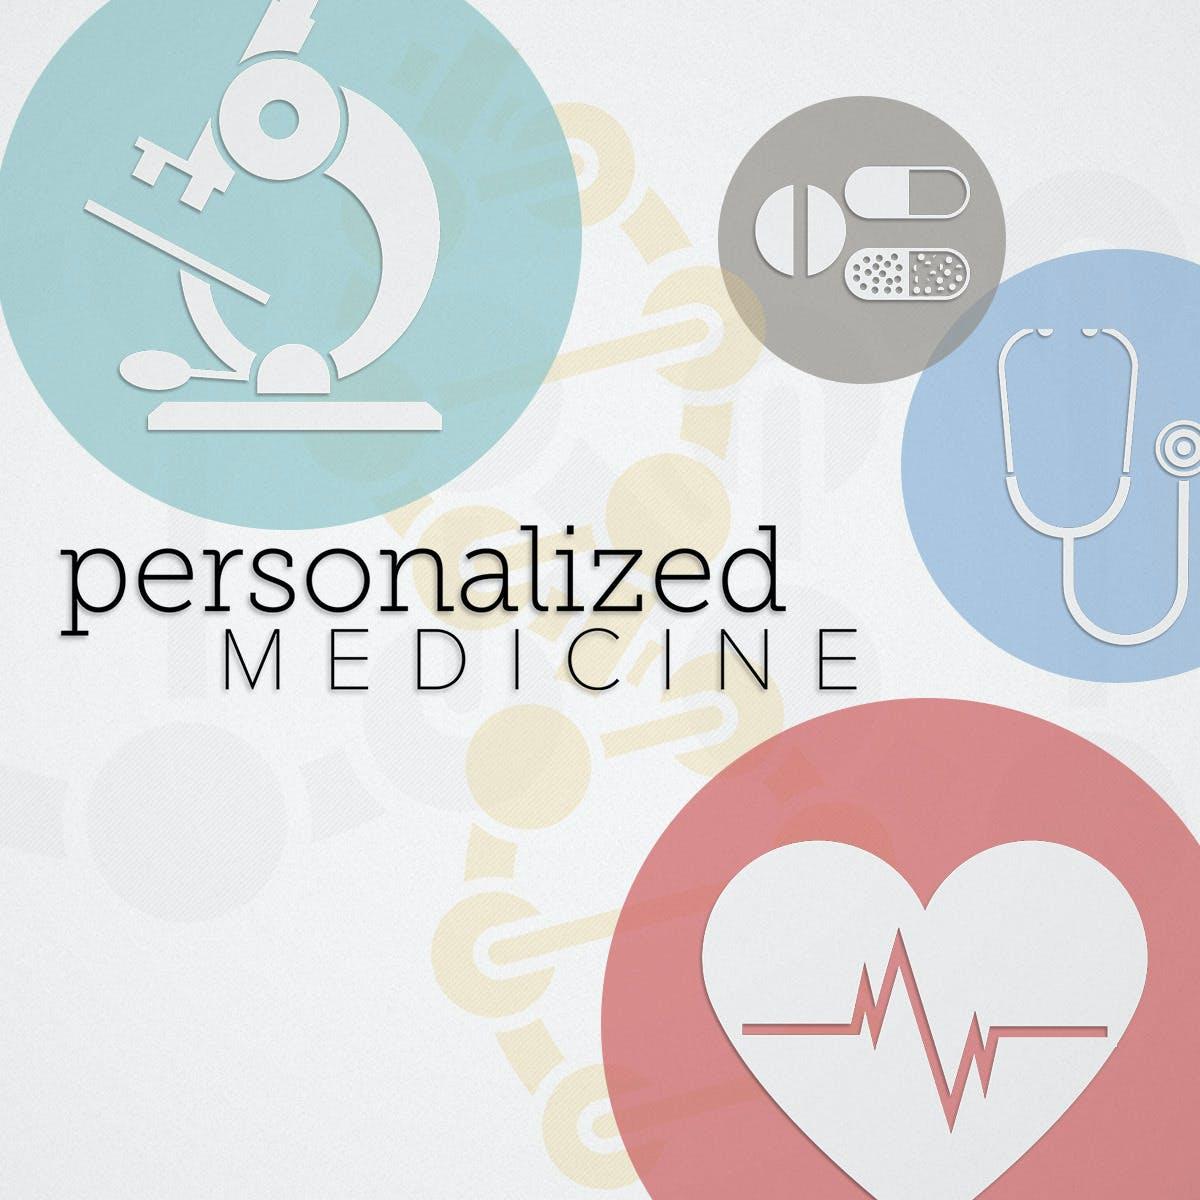 Case Studies in Personalized Medicine